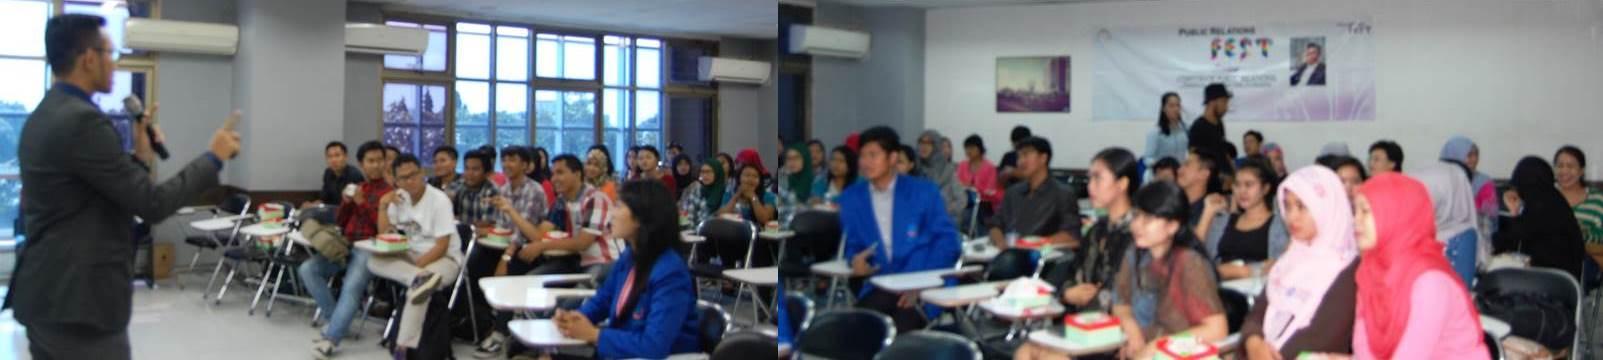 Seminar Corporate Public Relation, Fakultas Ilmu Komunikasi Universitas Esa Unggul